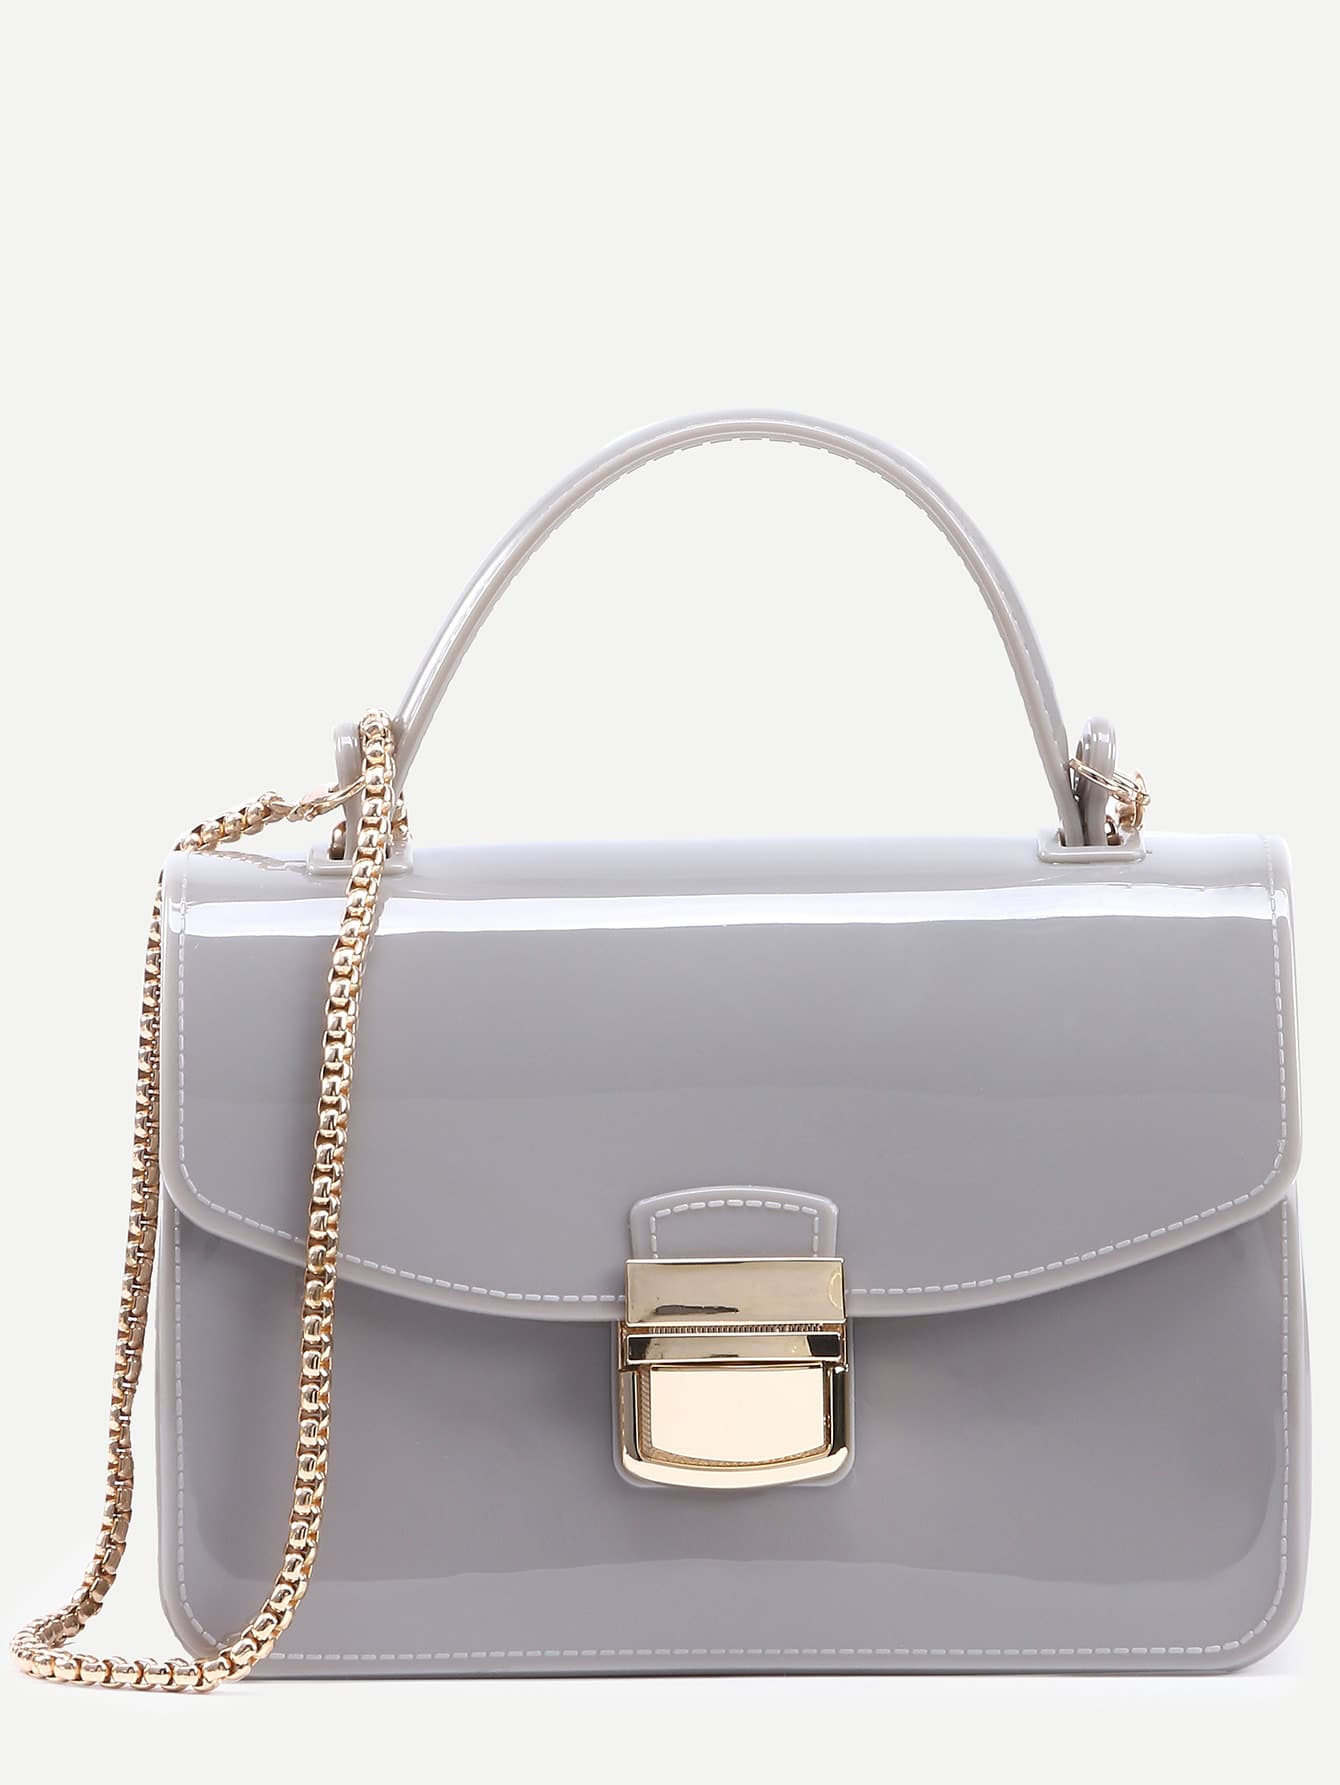 Light Grey Pushlock Closure Plastic Handbag With Chain